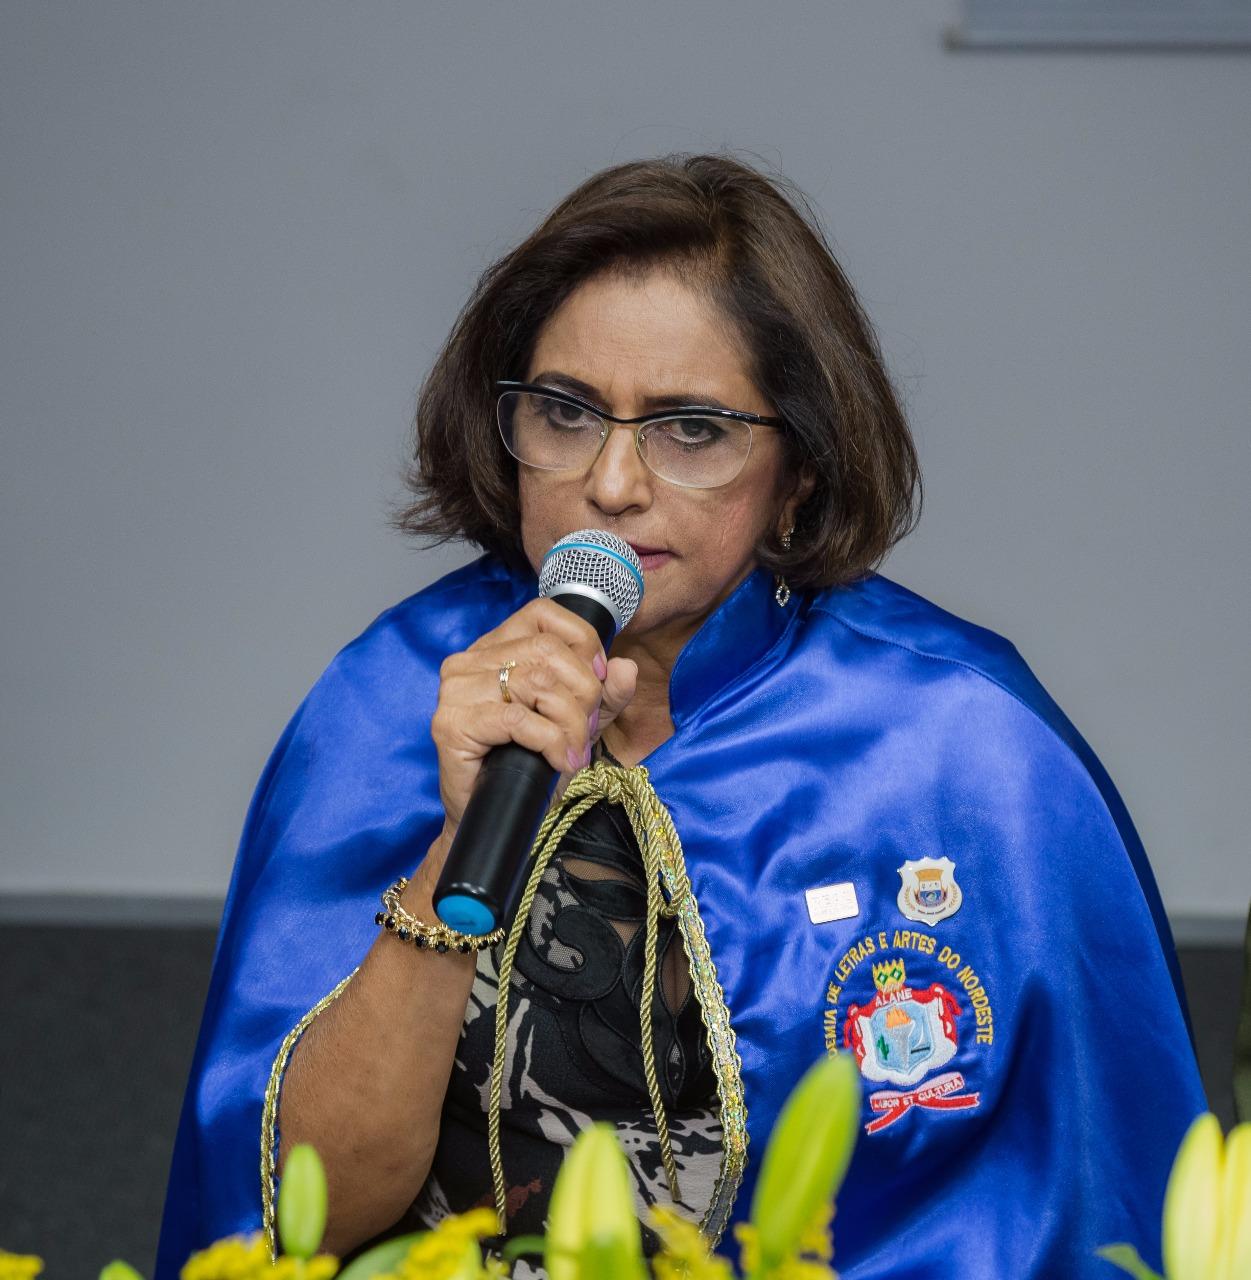 ALANE/Alagoas dá posse a novos membros da academia virtualmente